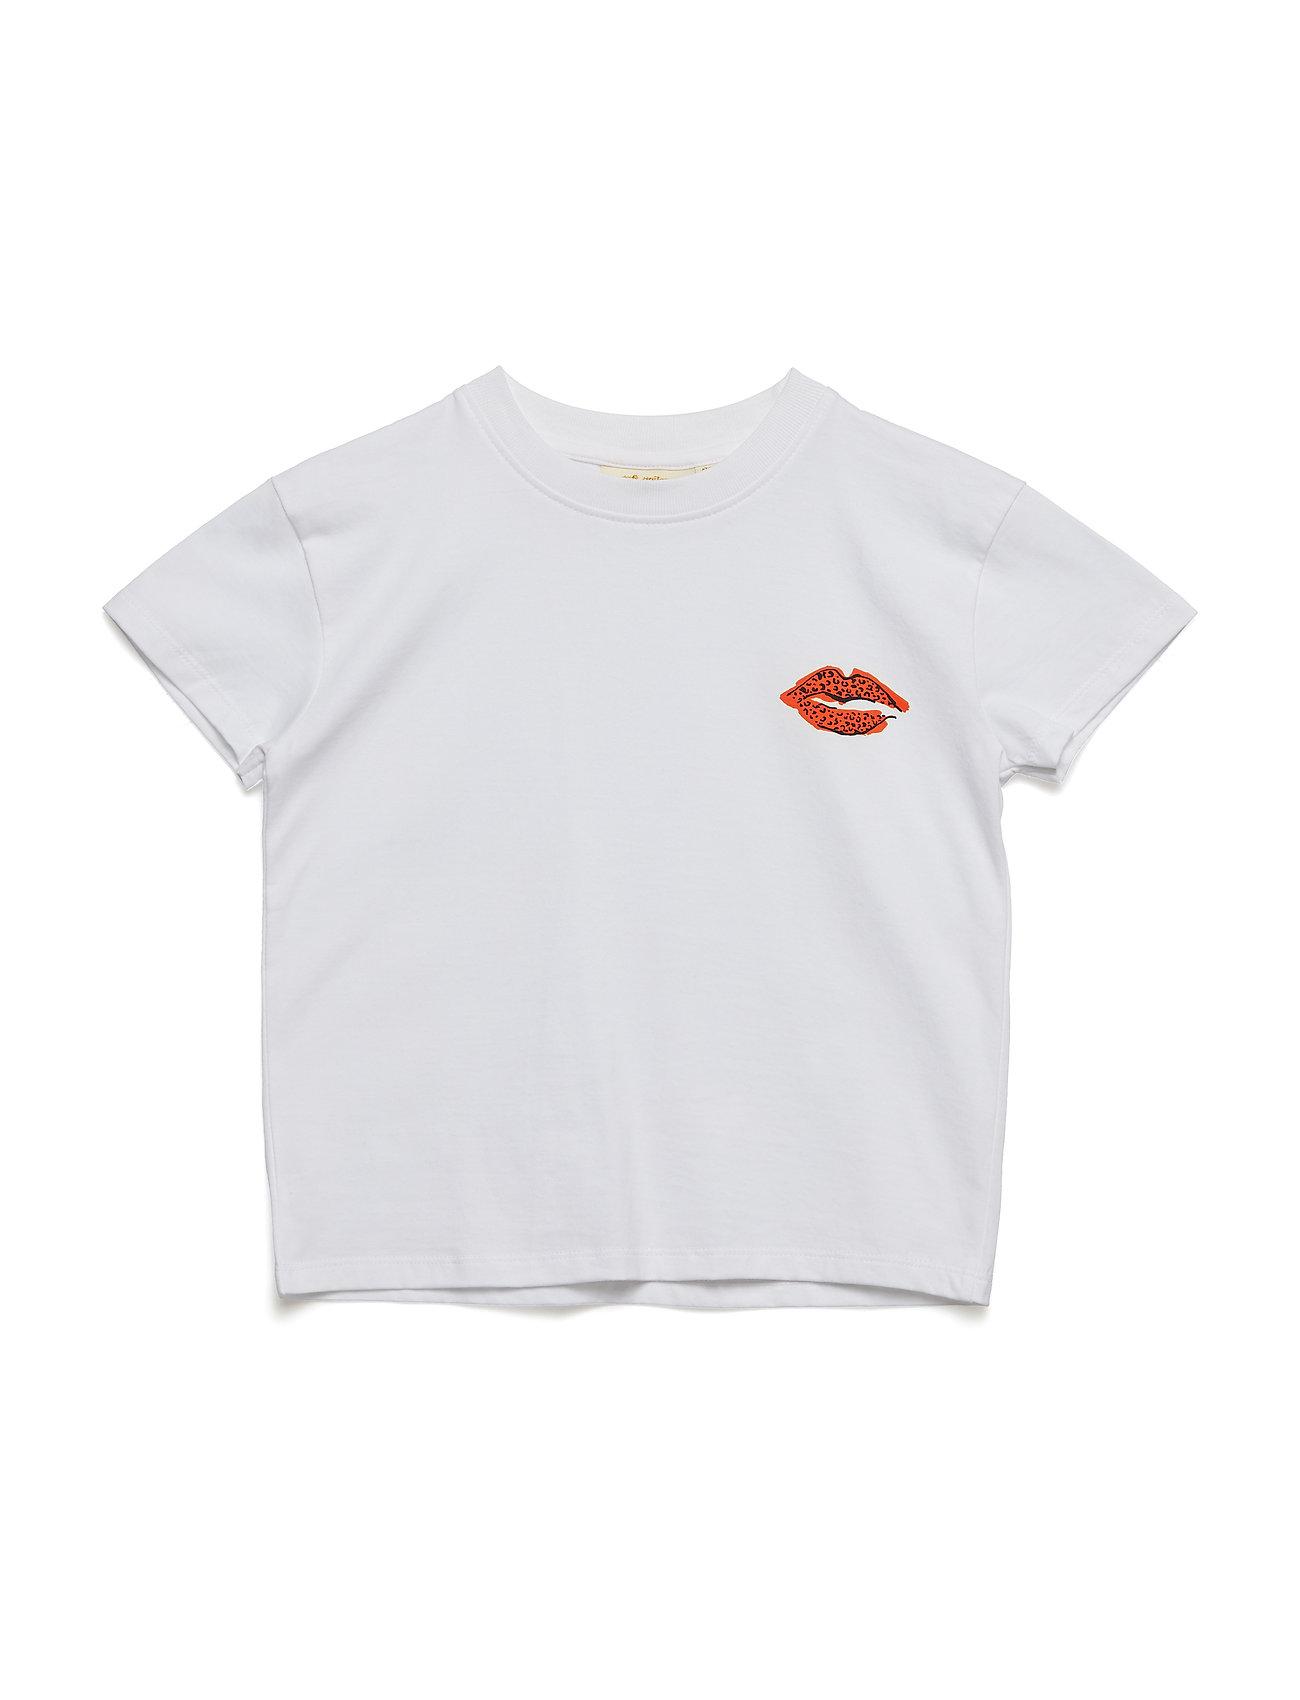 Soft Gallery Dharma T-shirt - WHITE, LEOLIPS